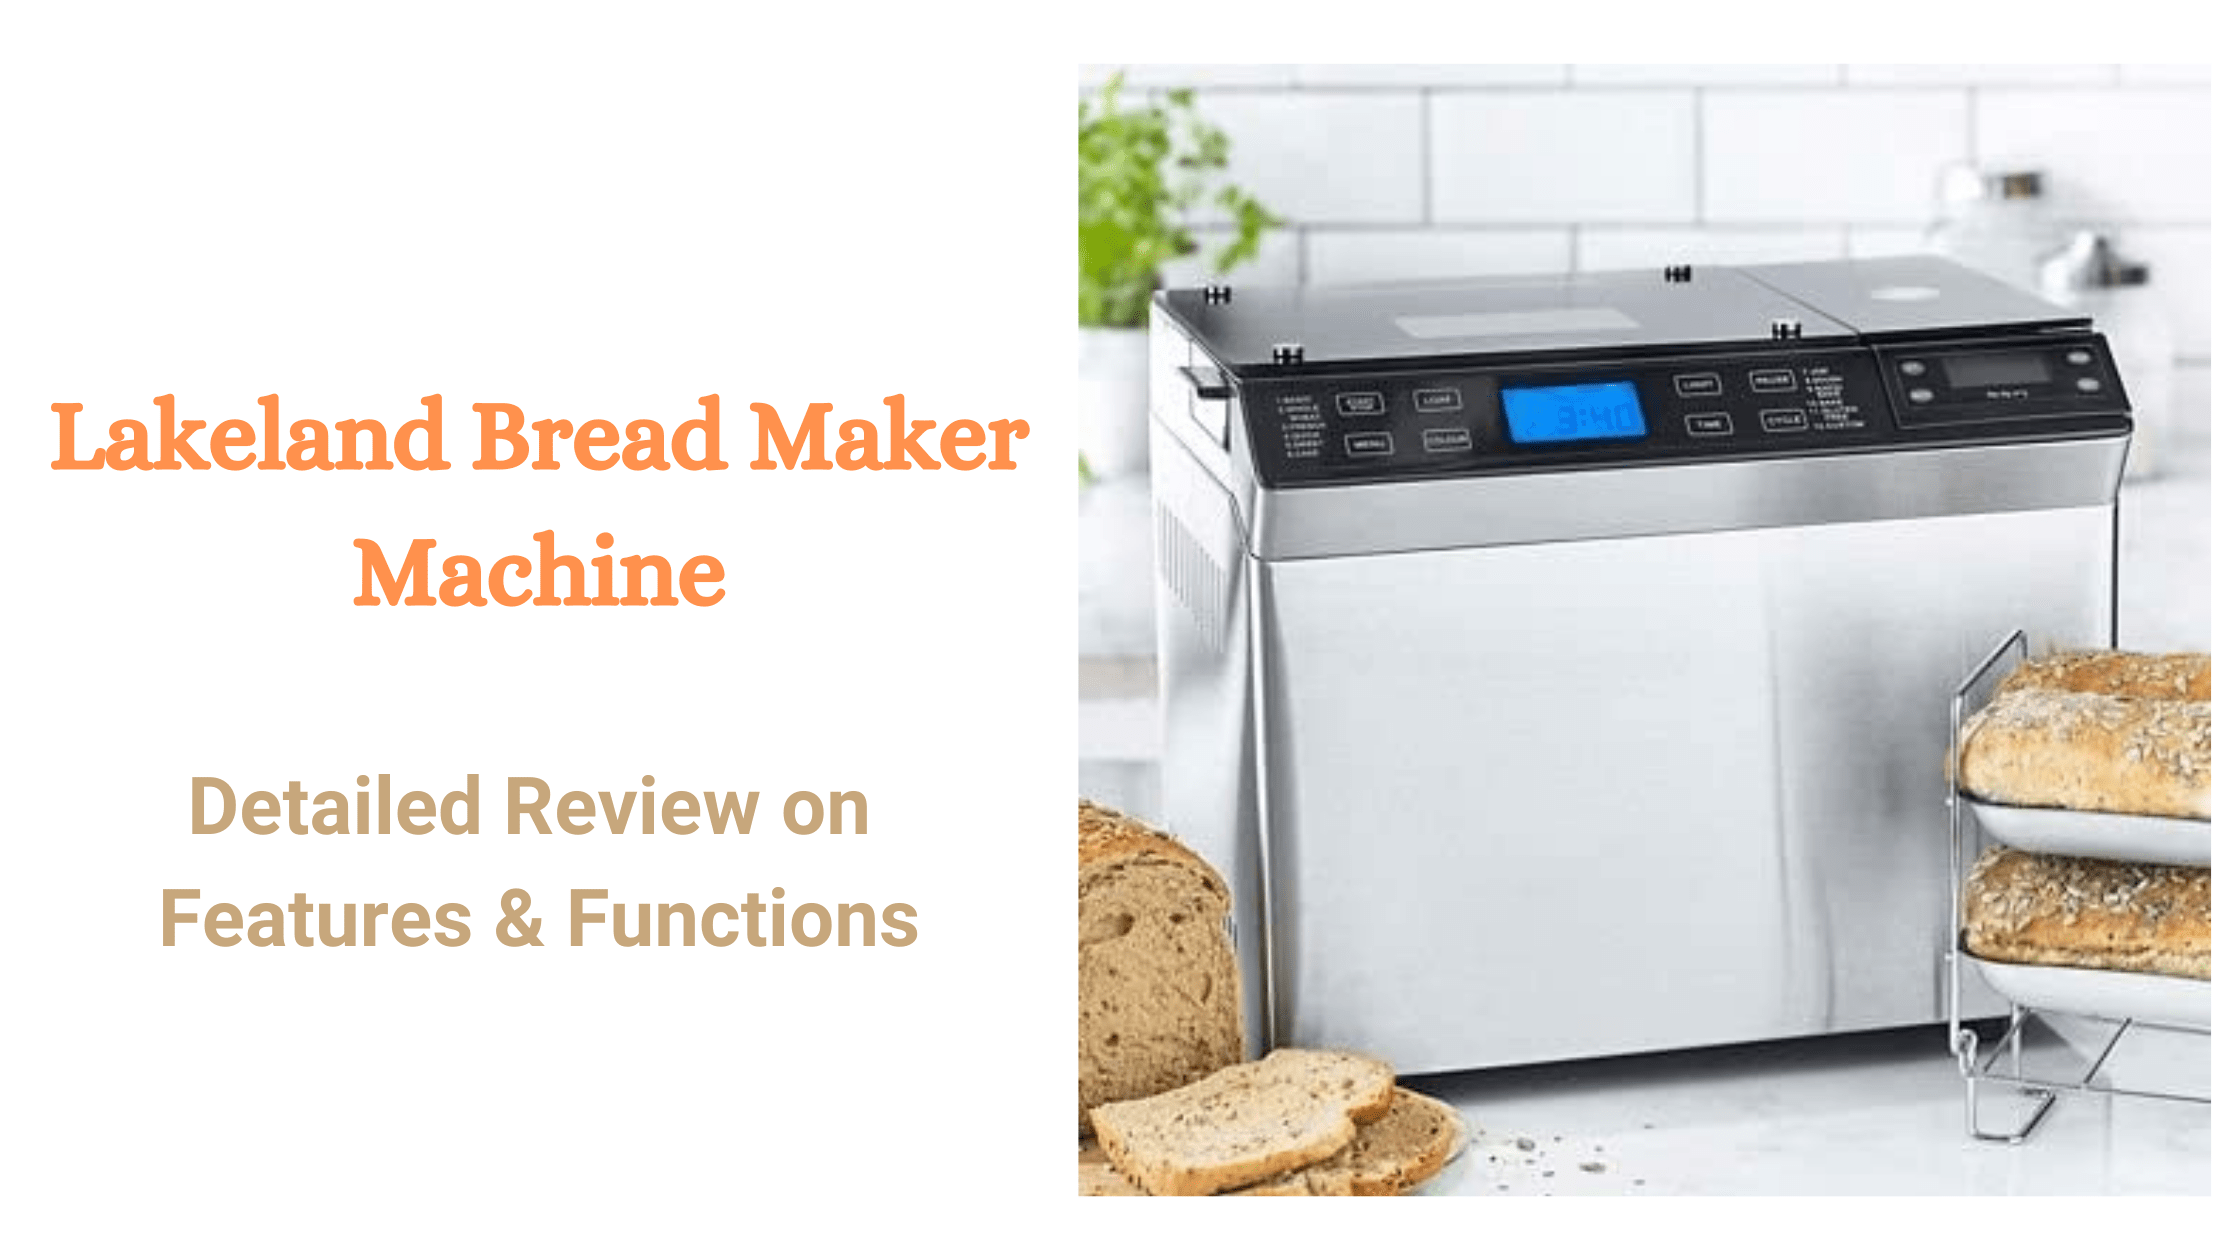 Lakeland Bread Maker Machine Review